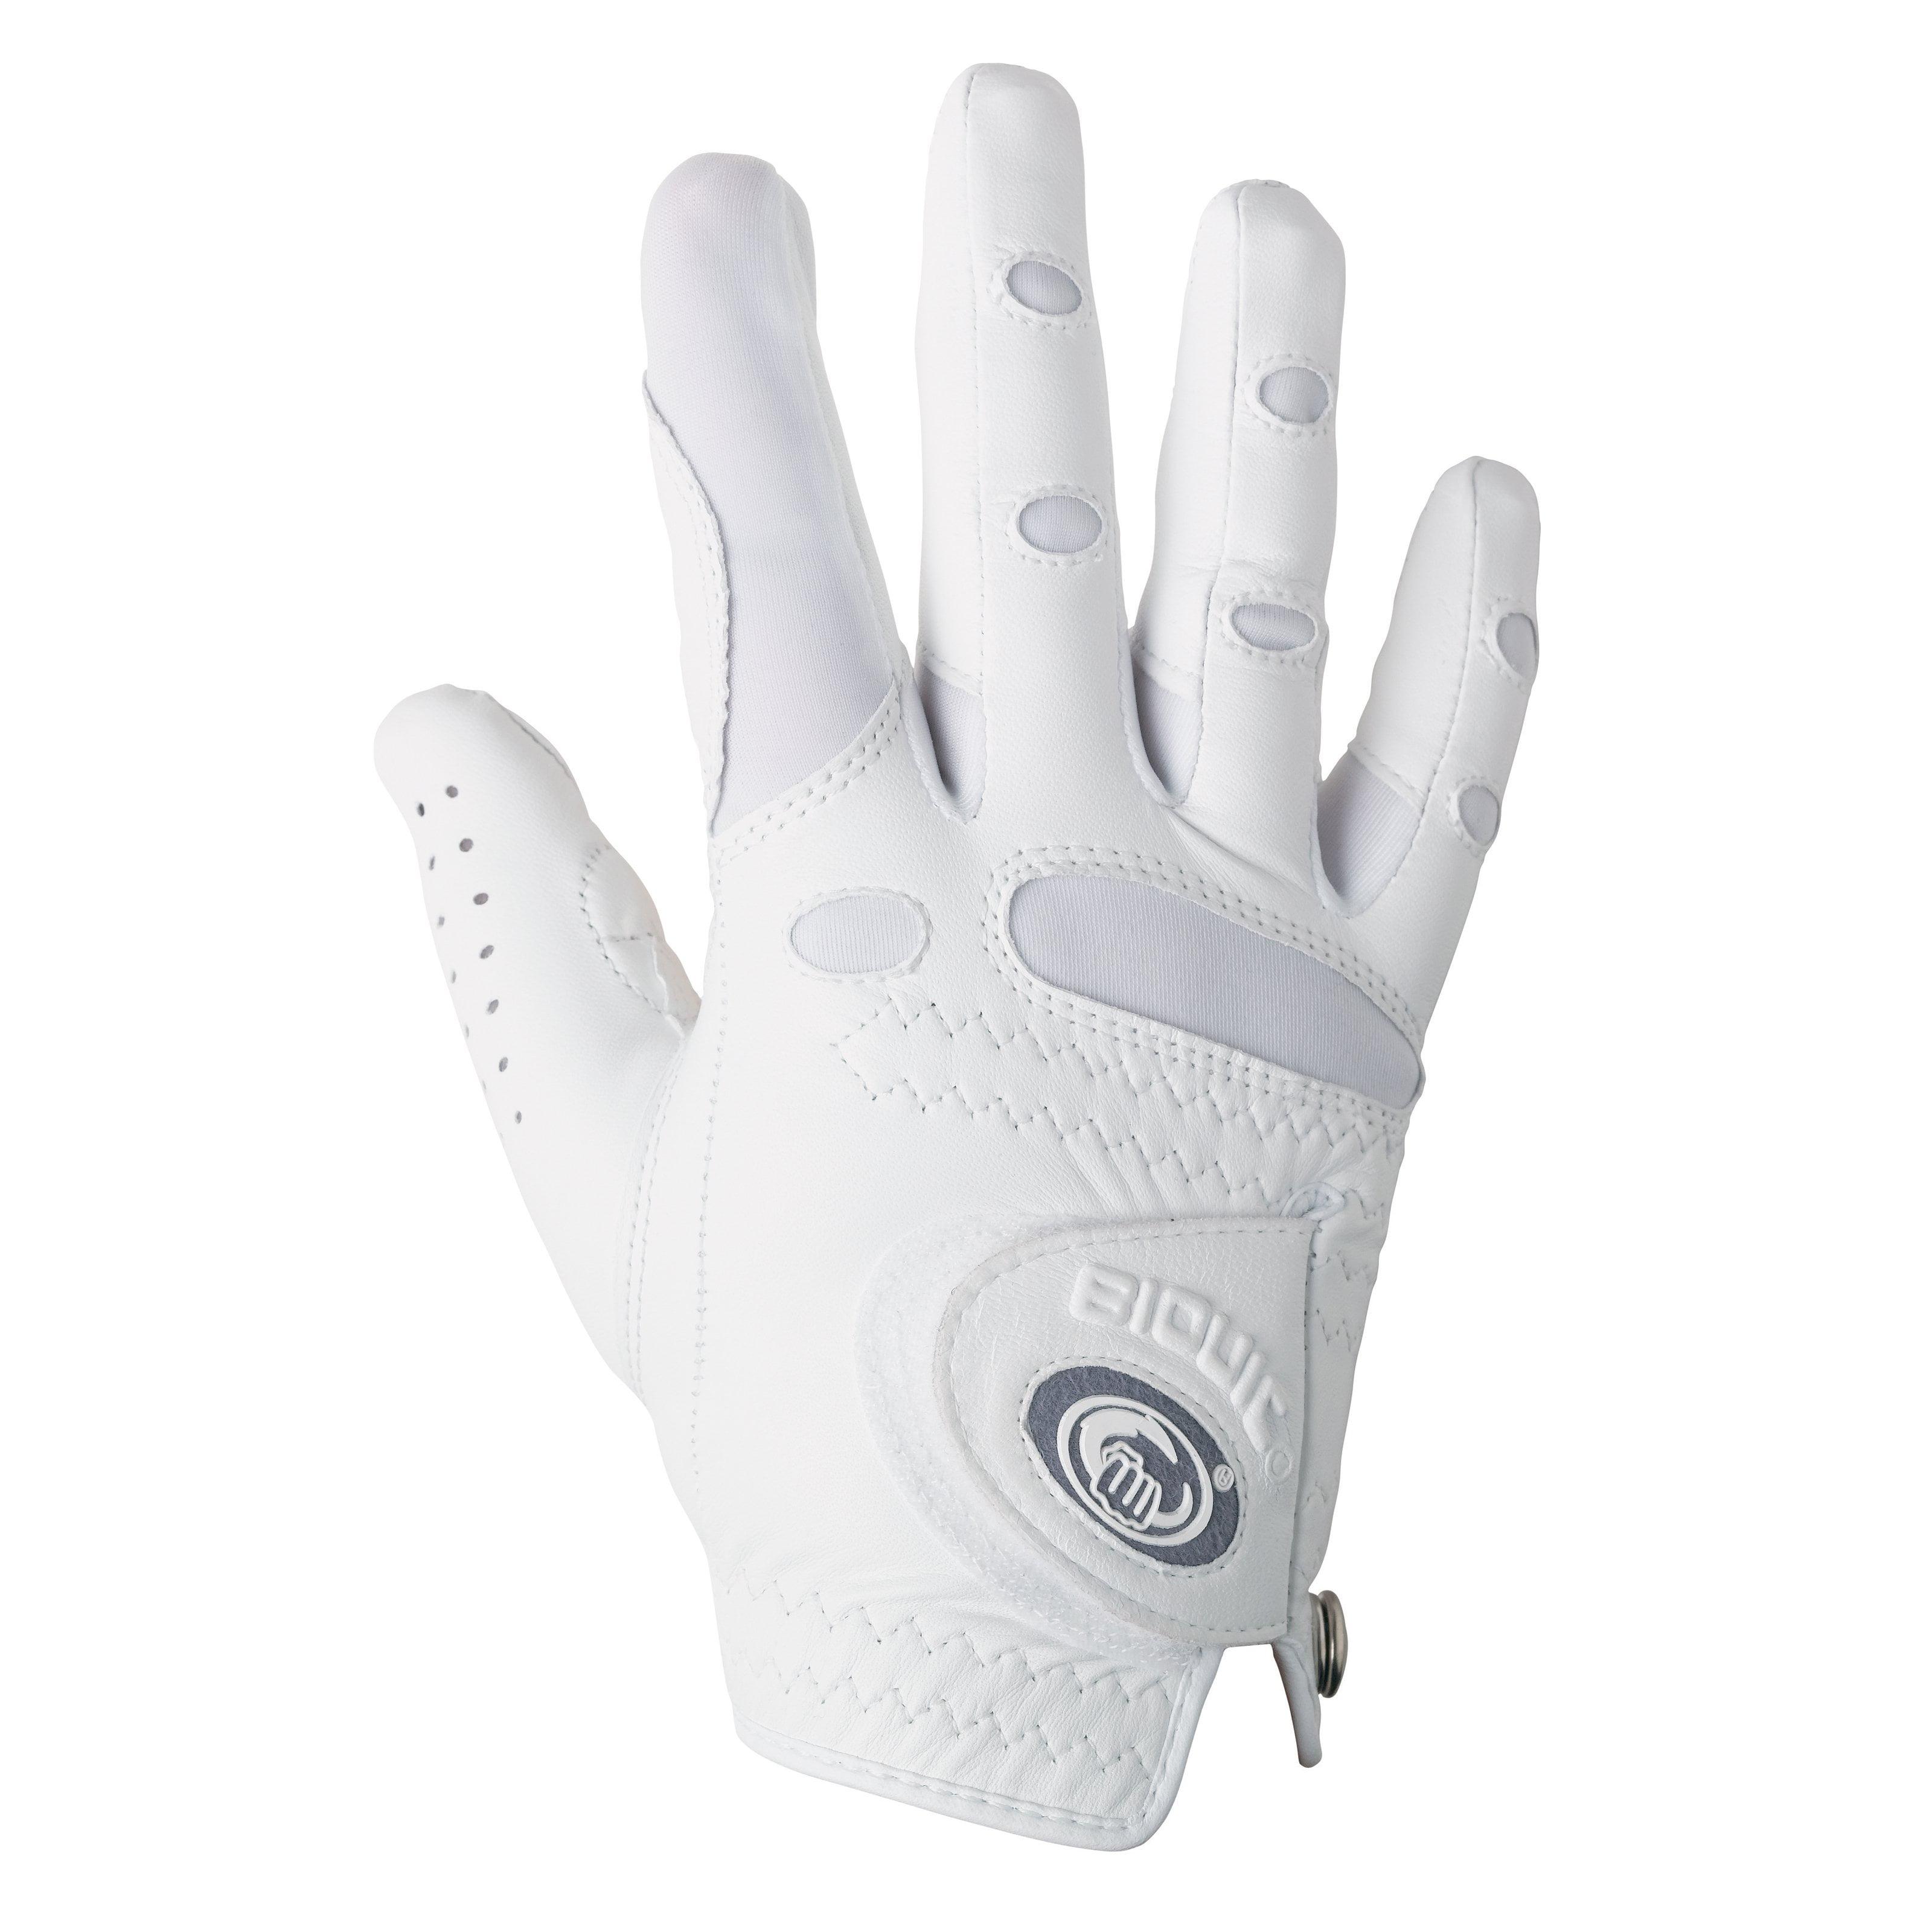 Bionic Women's Right Hand Classic Golf Glove All White by Bionic Glove